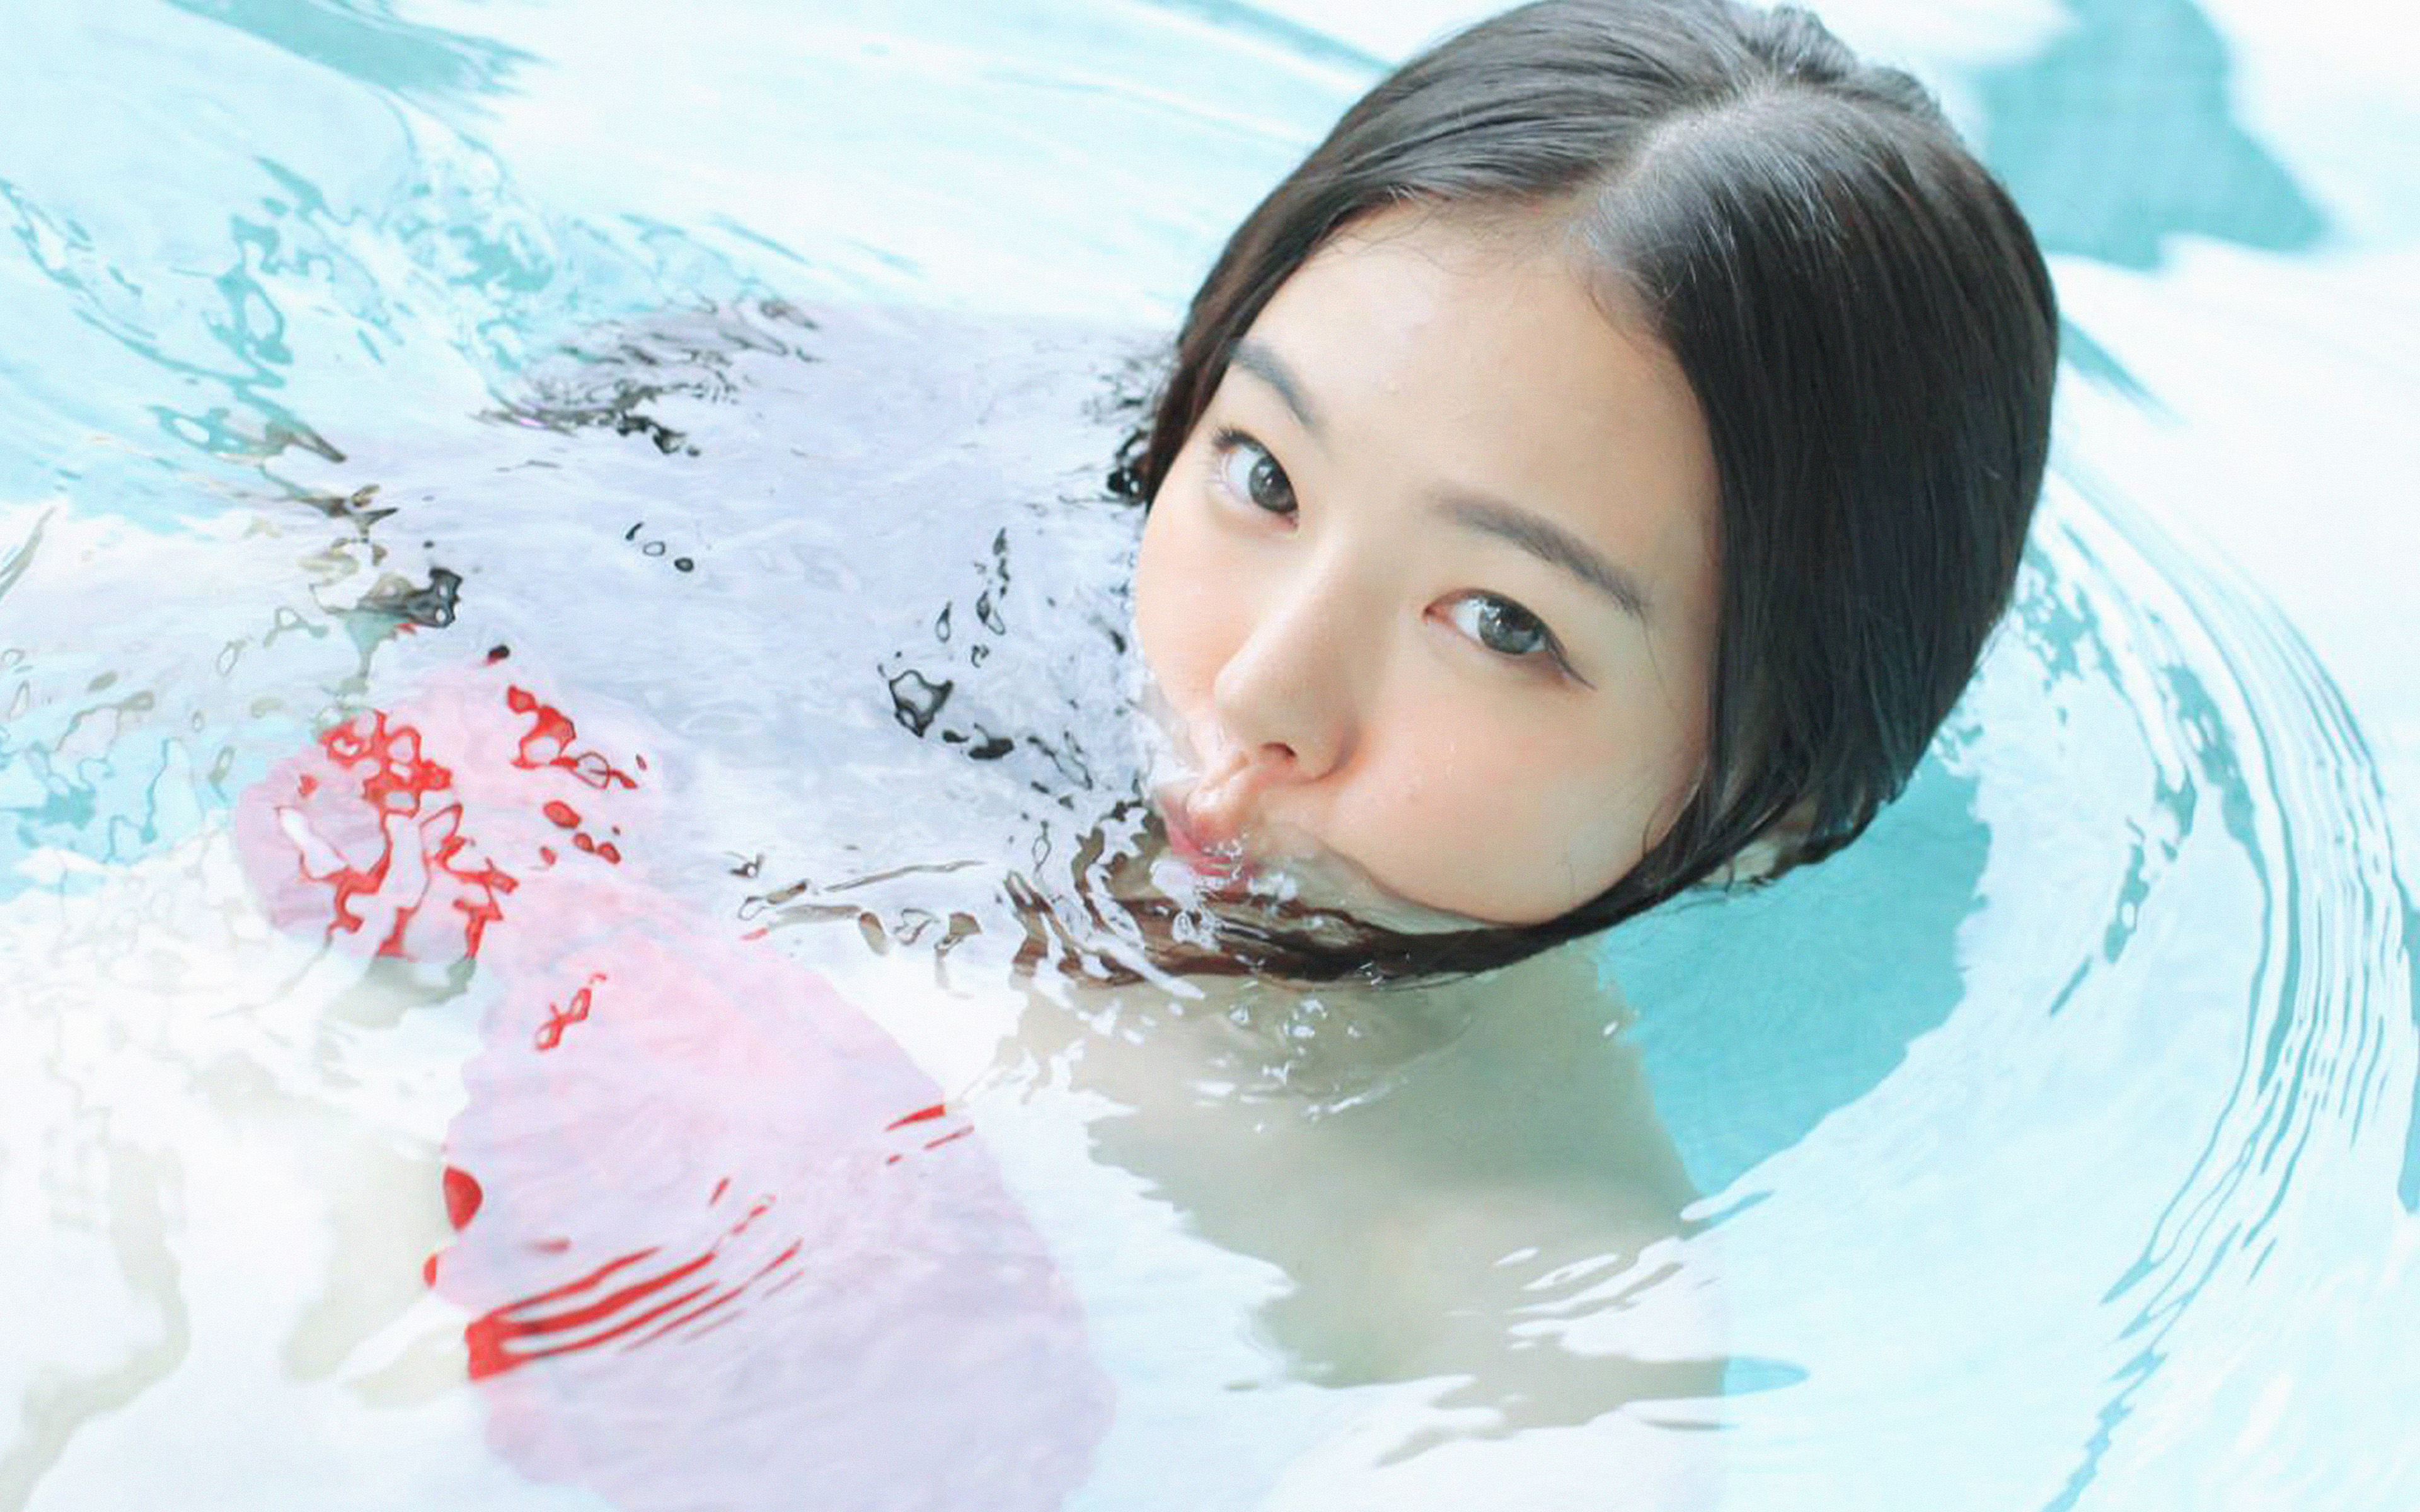 Hg84 Kpop Hanuel Swim Fun Girl Papersco